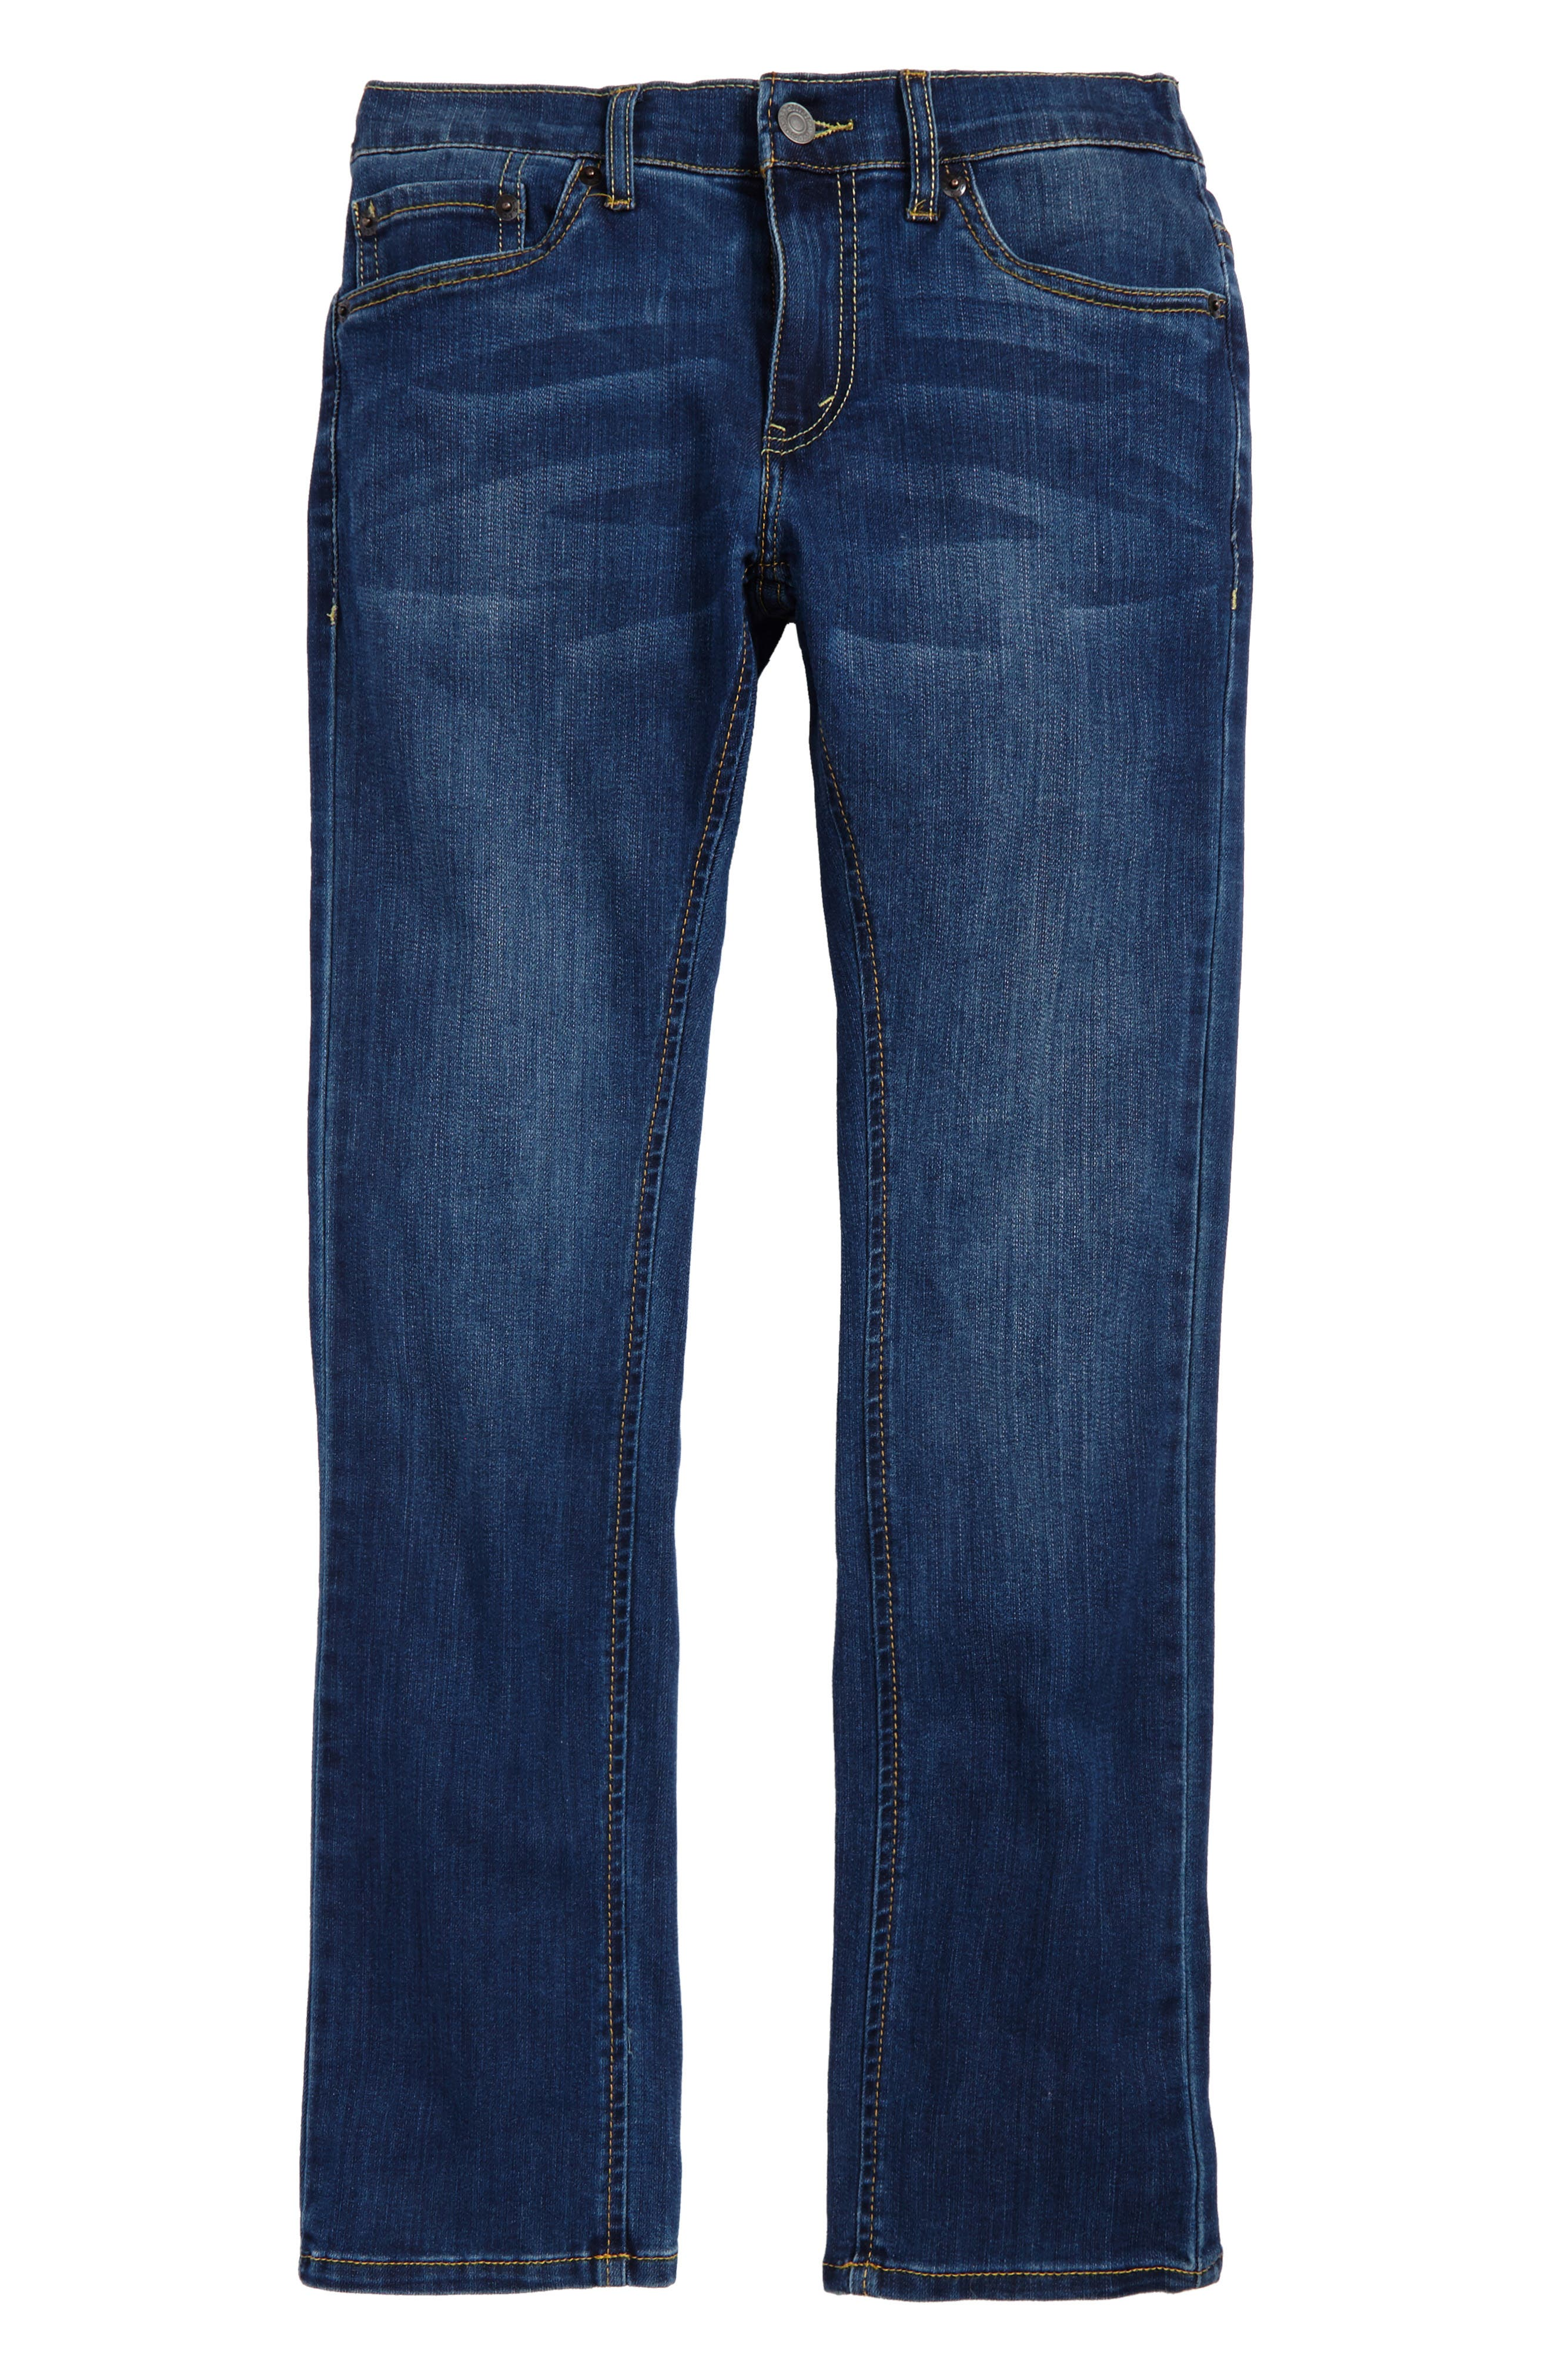 Main Image - Levi's® Comfort Slim Fit Straight Leg Jeans (Big Boys)